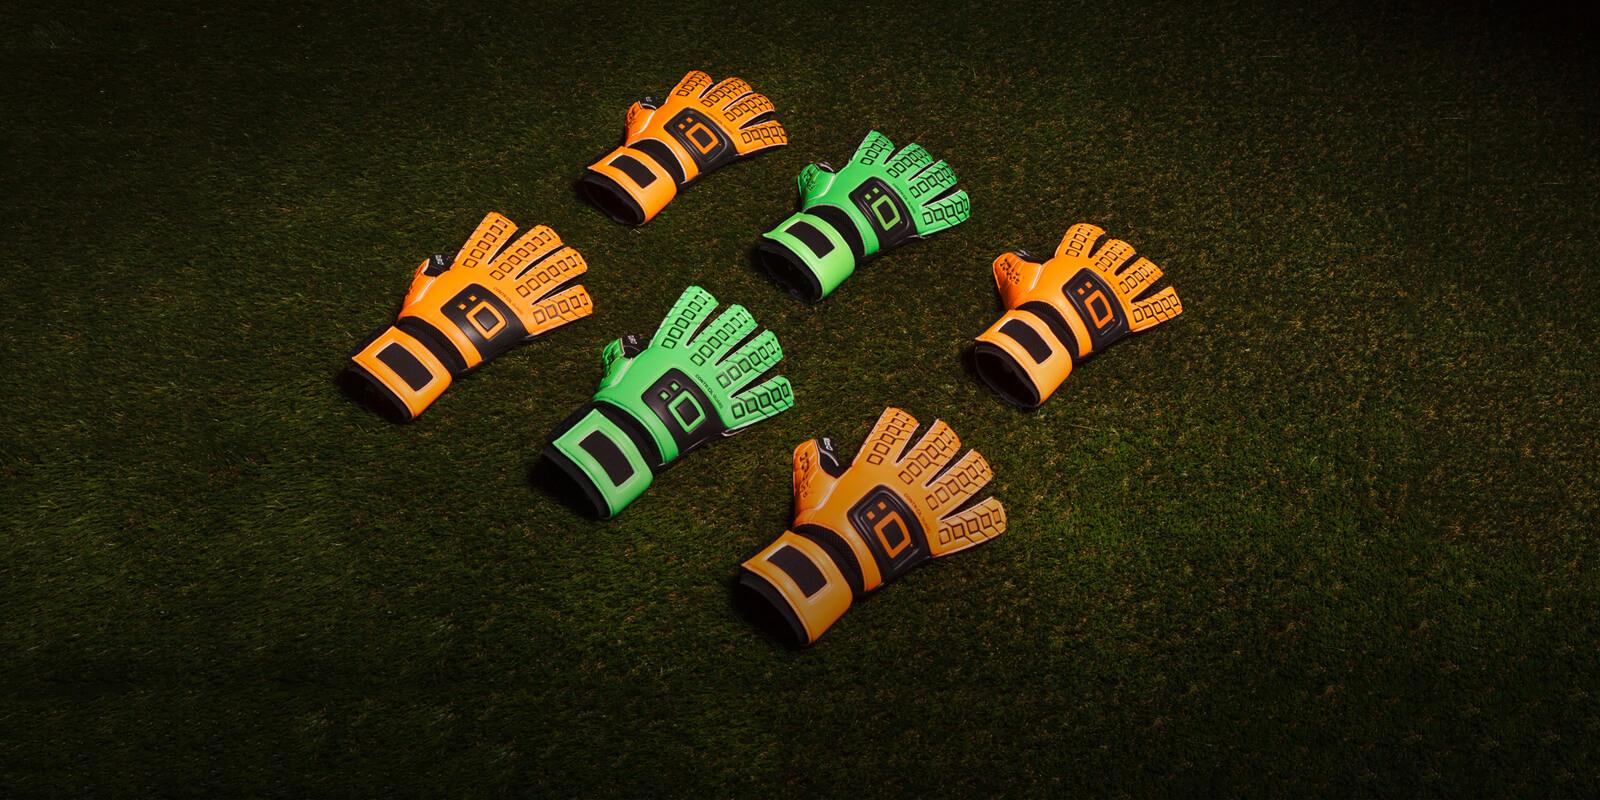 goodbye-adidas-oliver-kahn-launches-goalkeeper-brand-banner